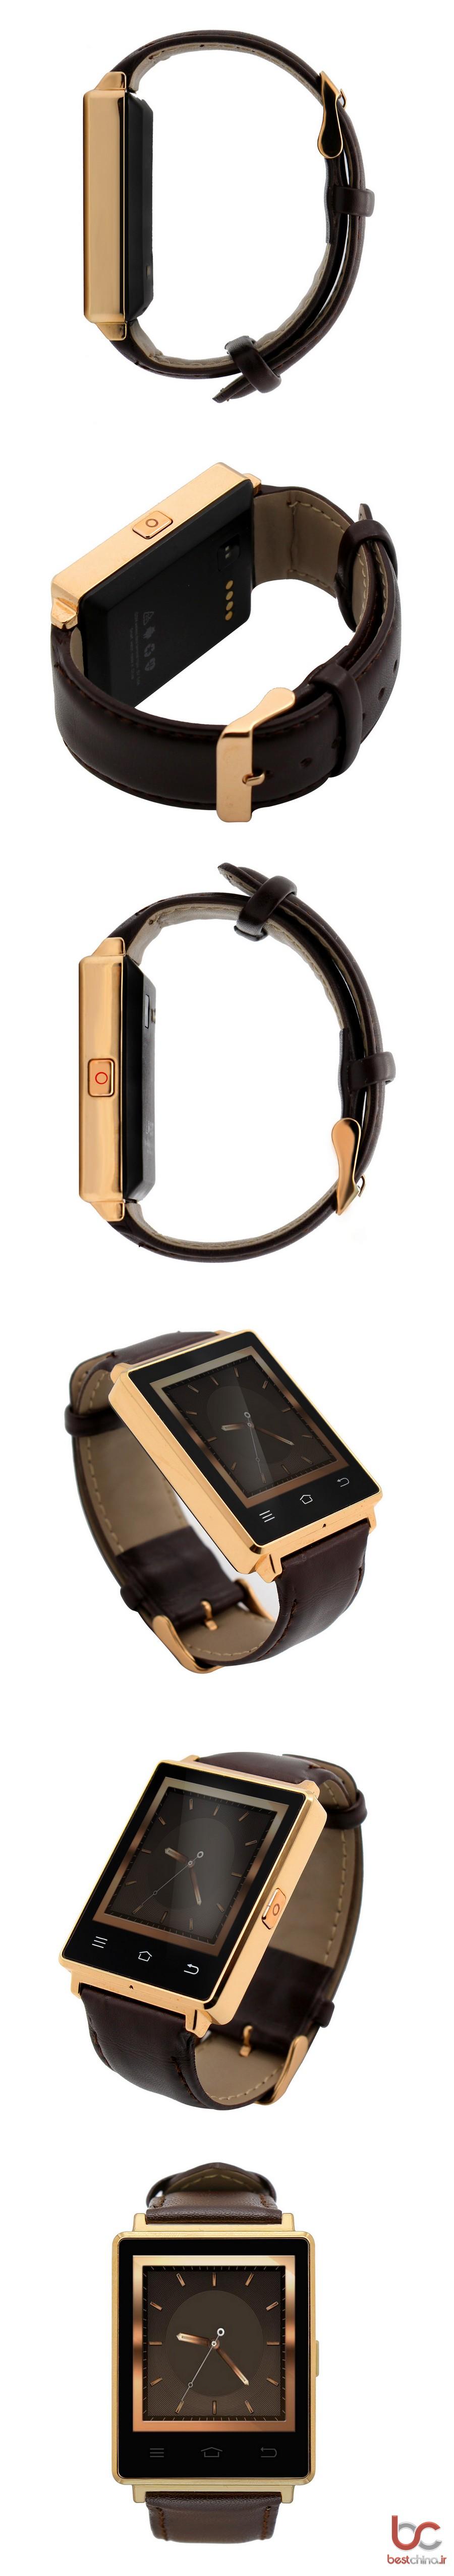 No.1 D6 smartwatch (9)